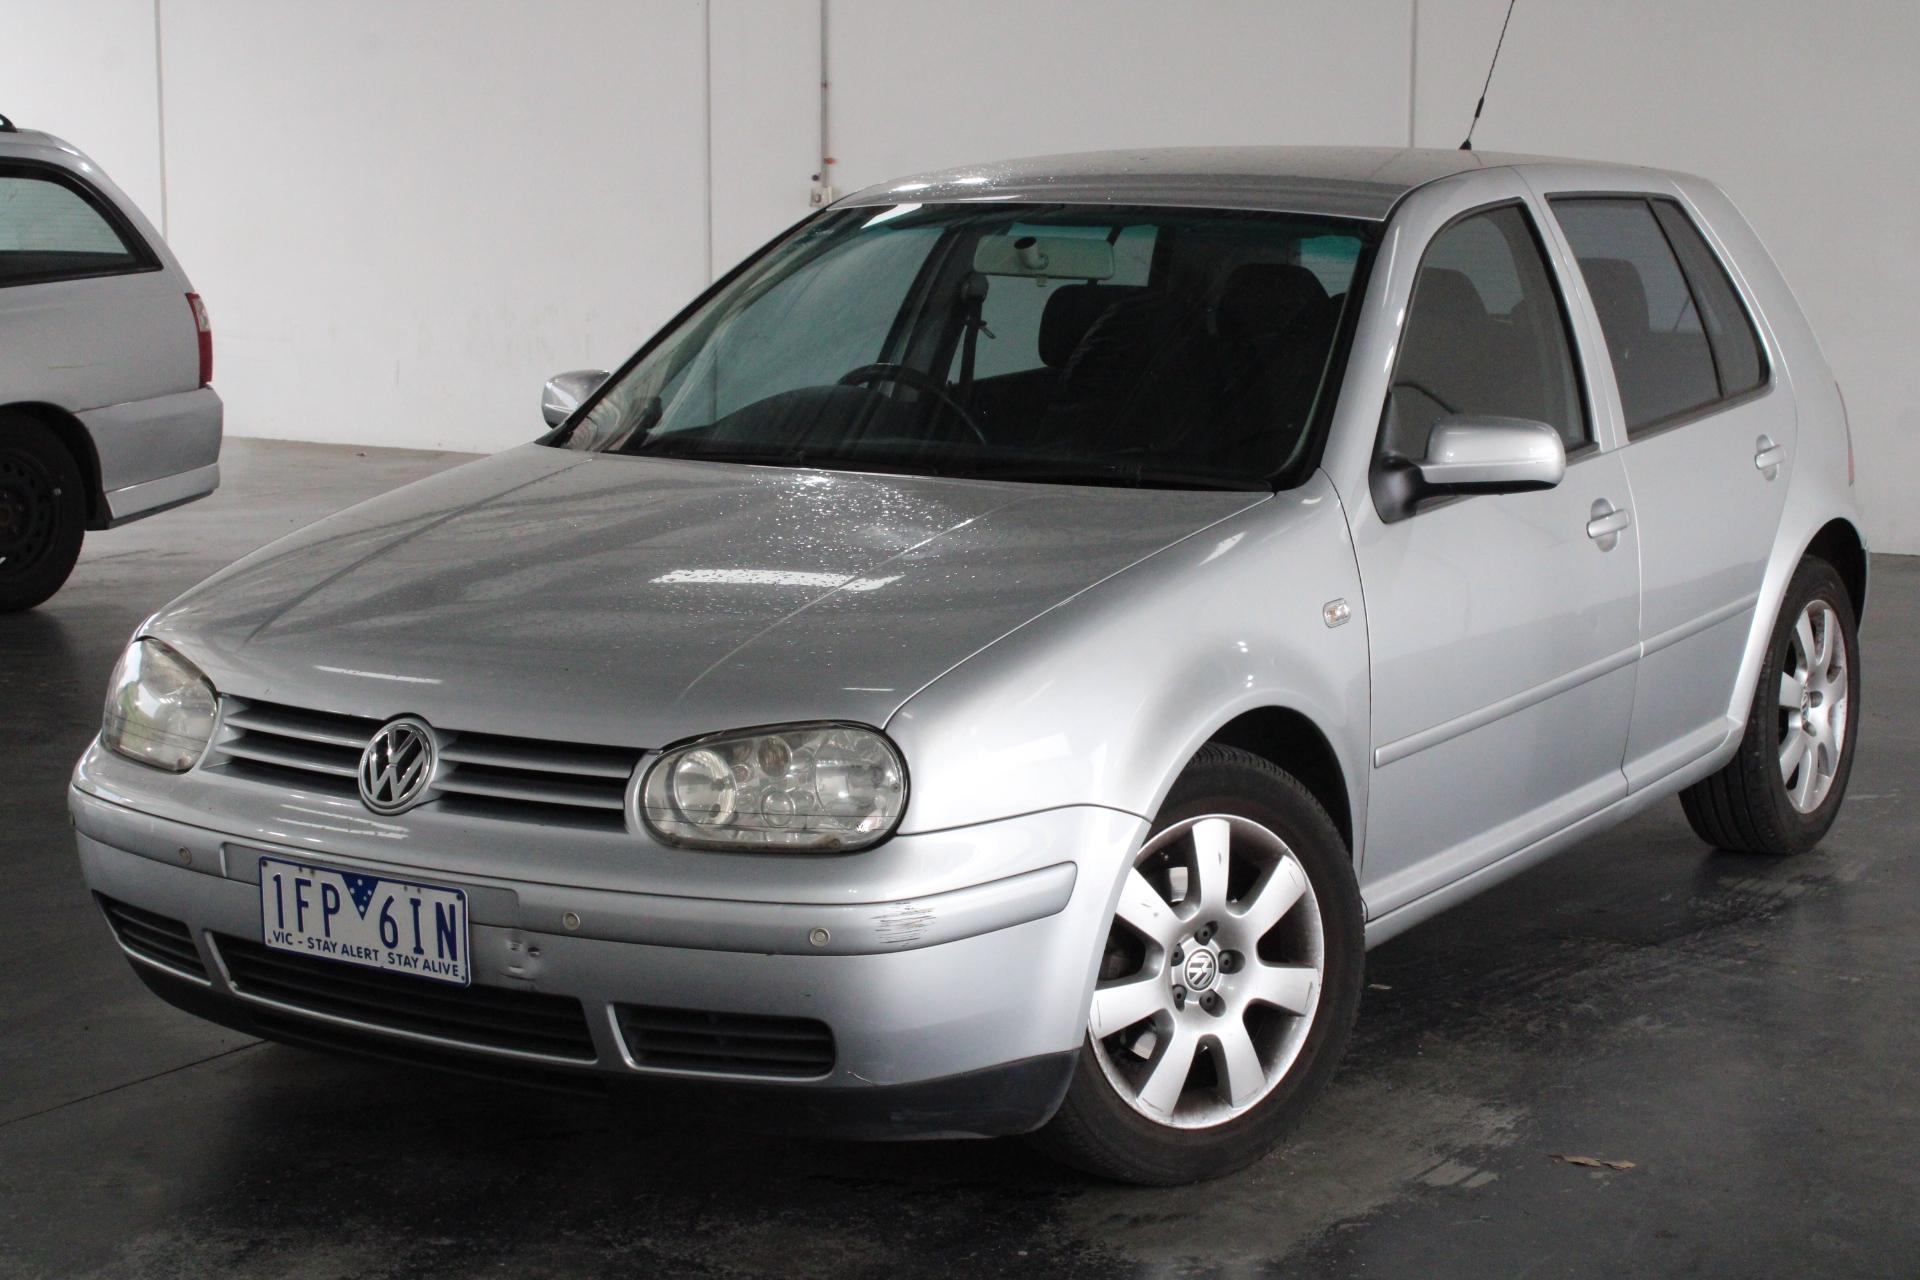 2004 Volkswagen Golf 2.0 Generation A4 Automatic Hatchback